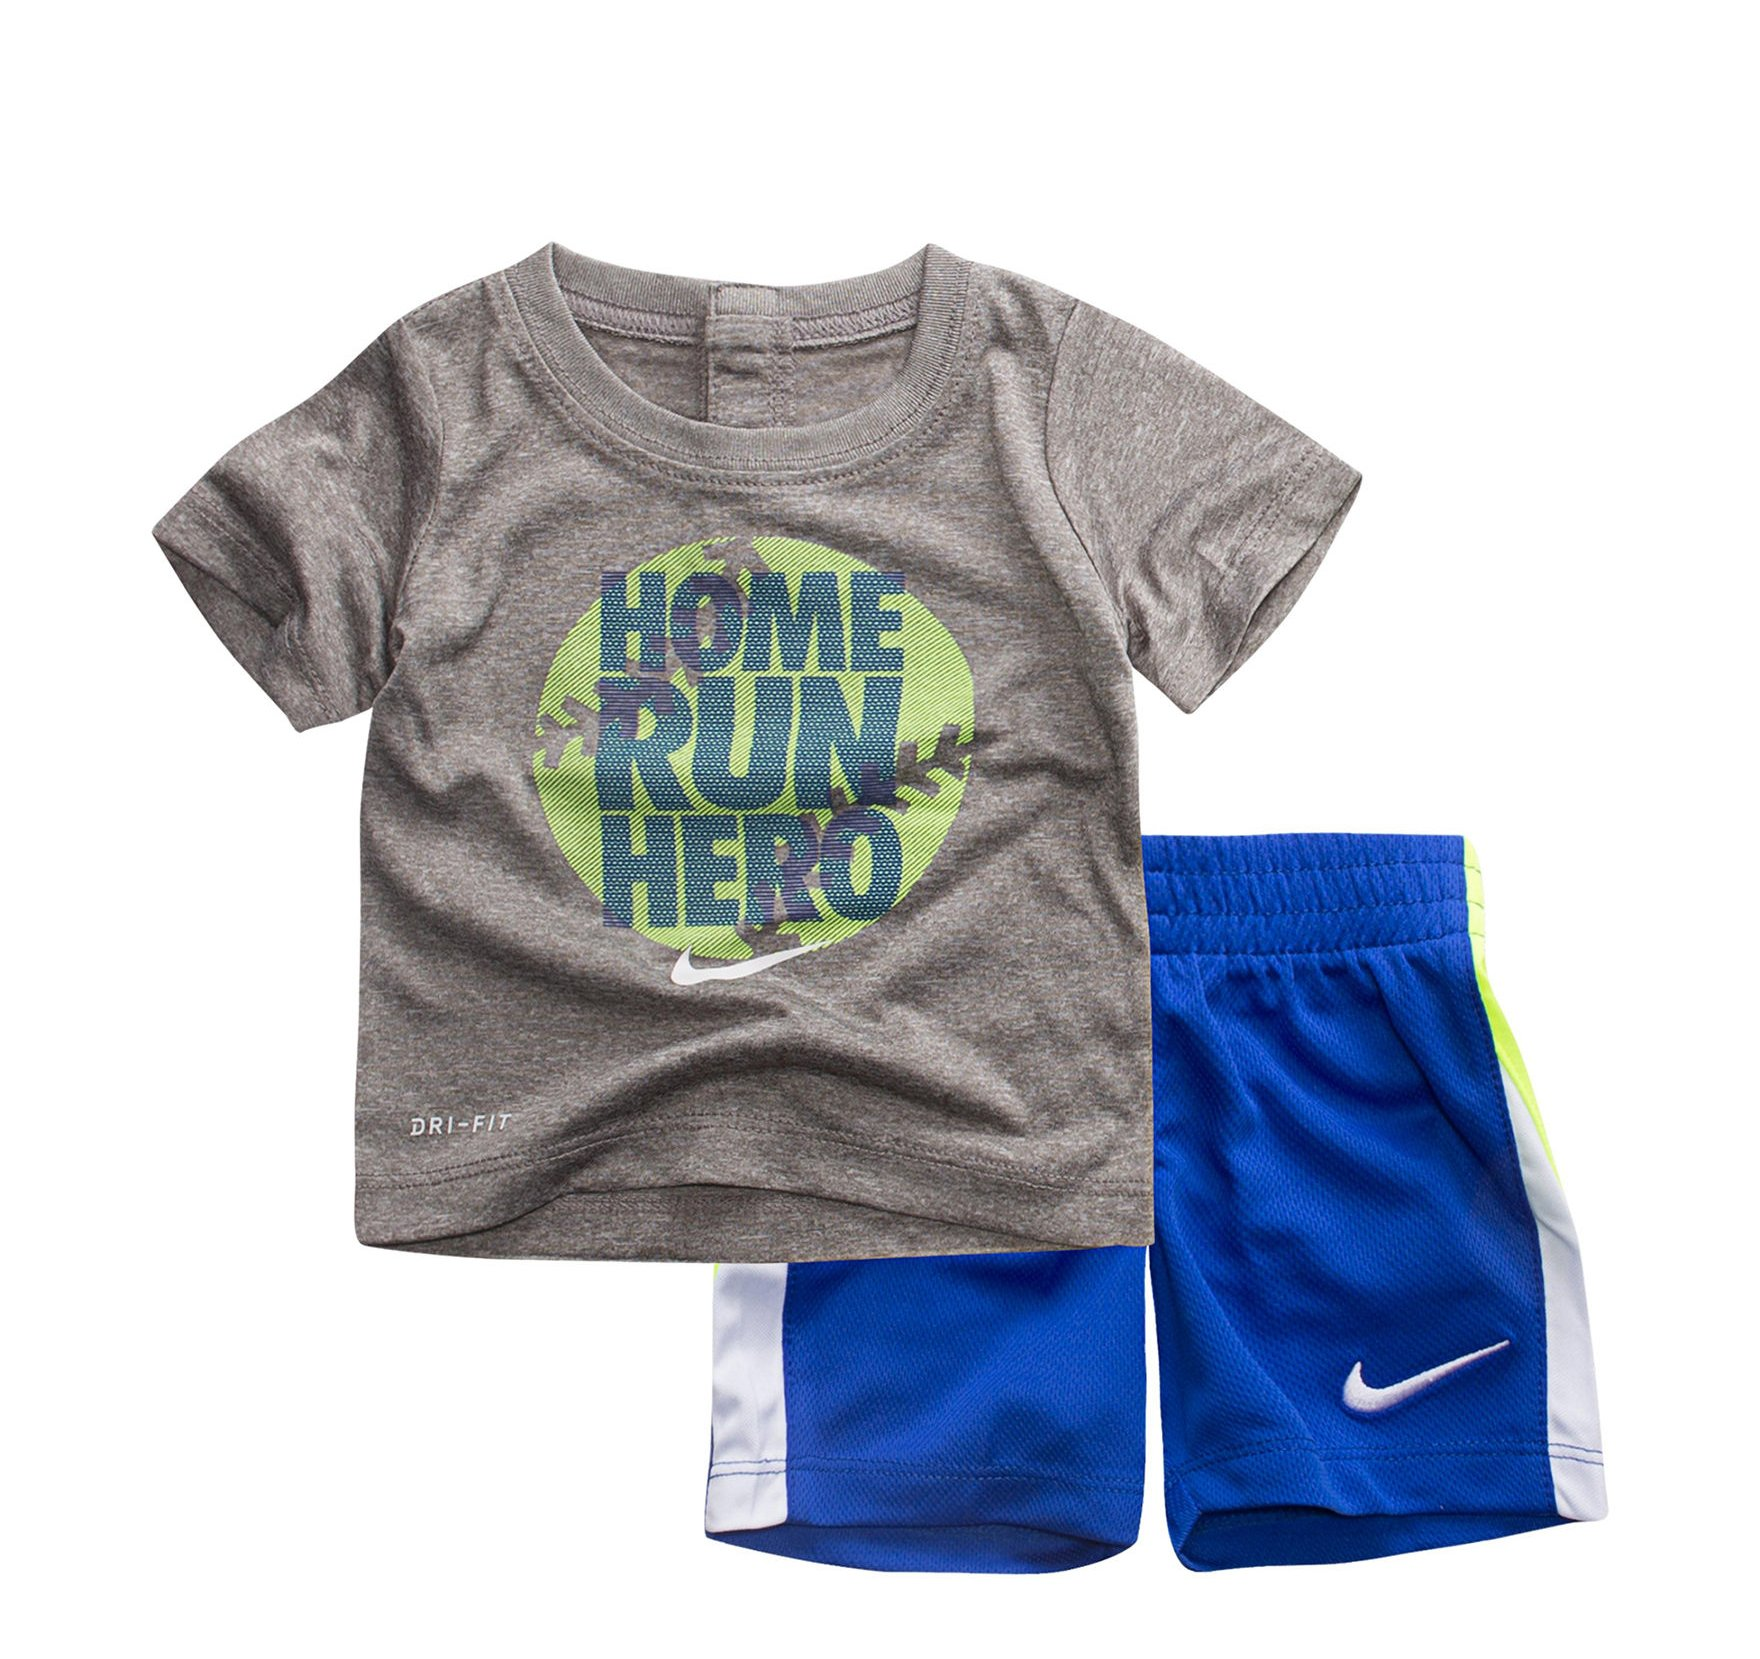 NIKE Toddler Boys' Dri Fit Short Sleeve T-Shirt and Short 2 Piece Set (Dark Grey Heather(86D266-042)/Blue, 4)